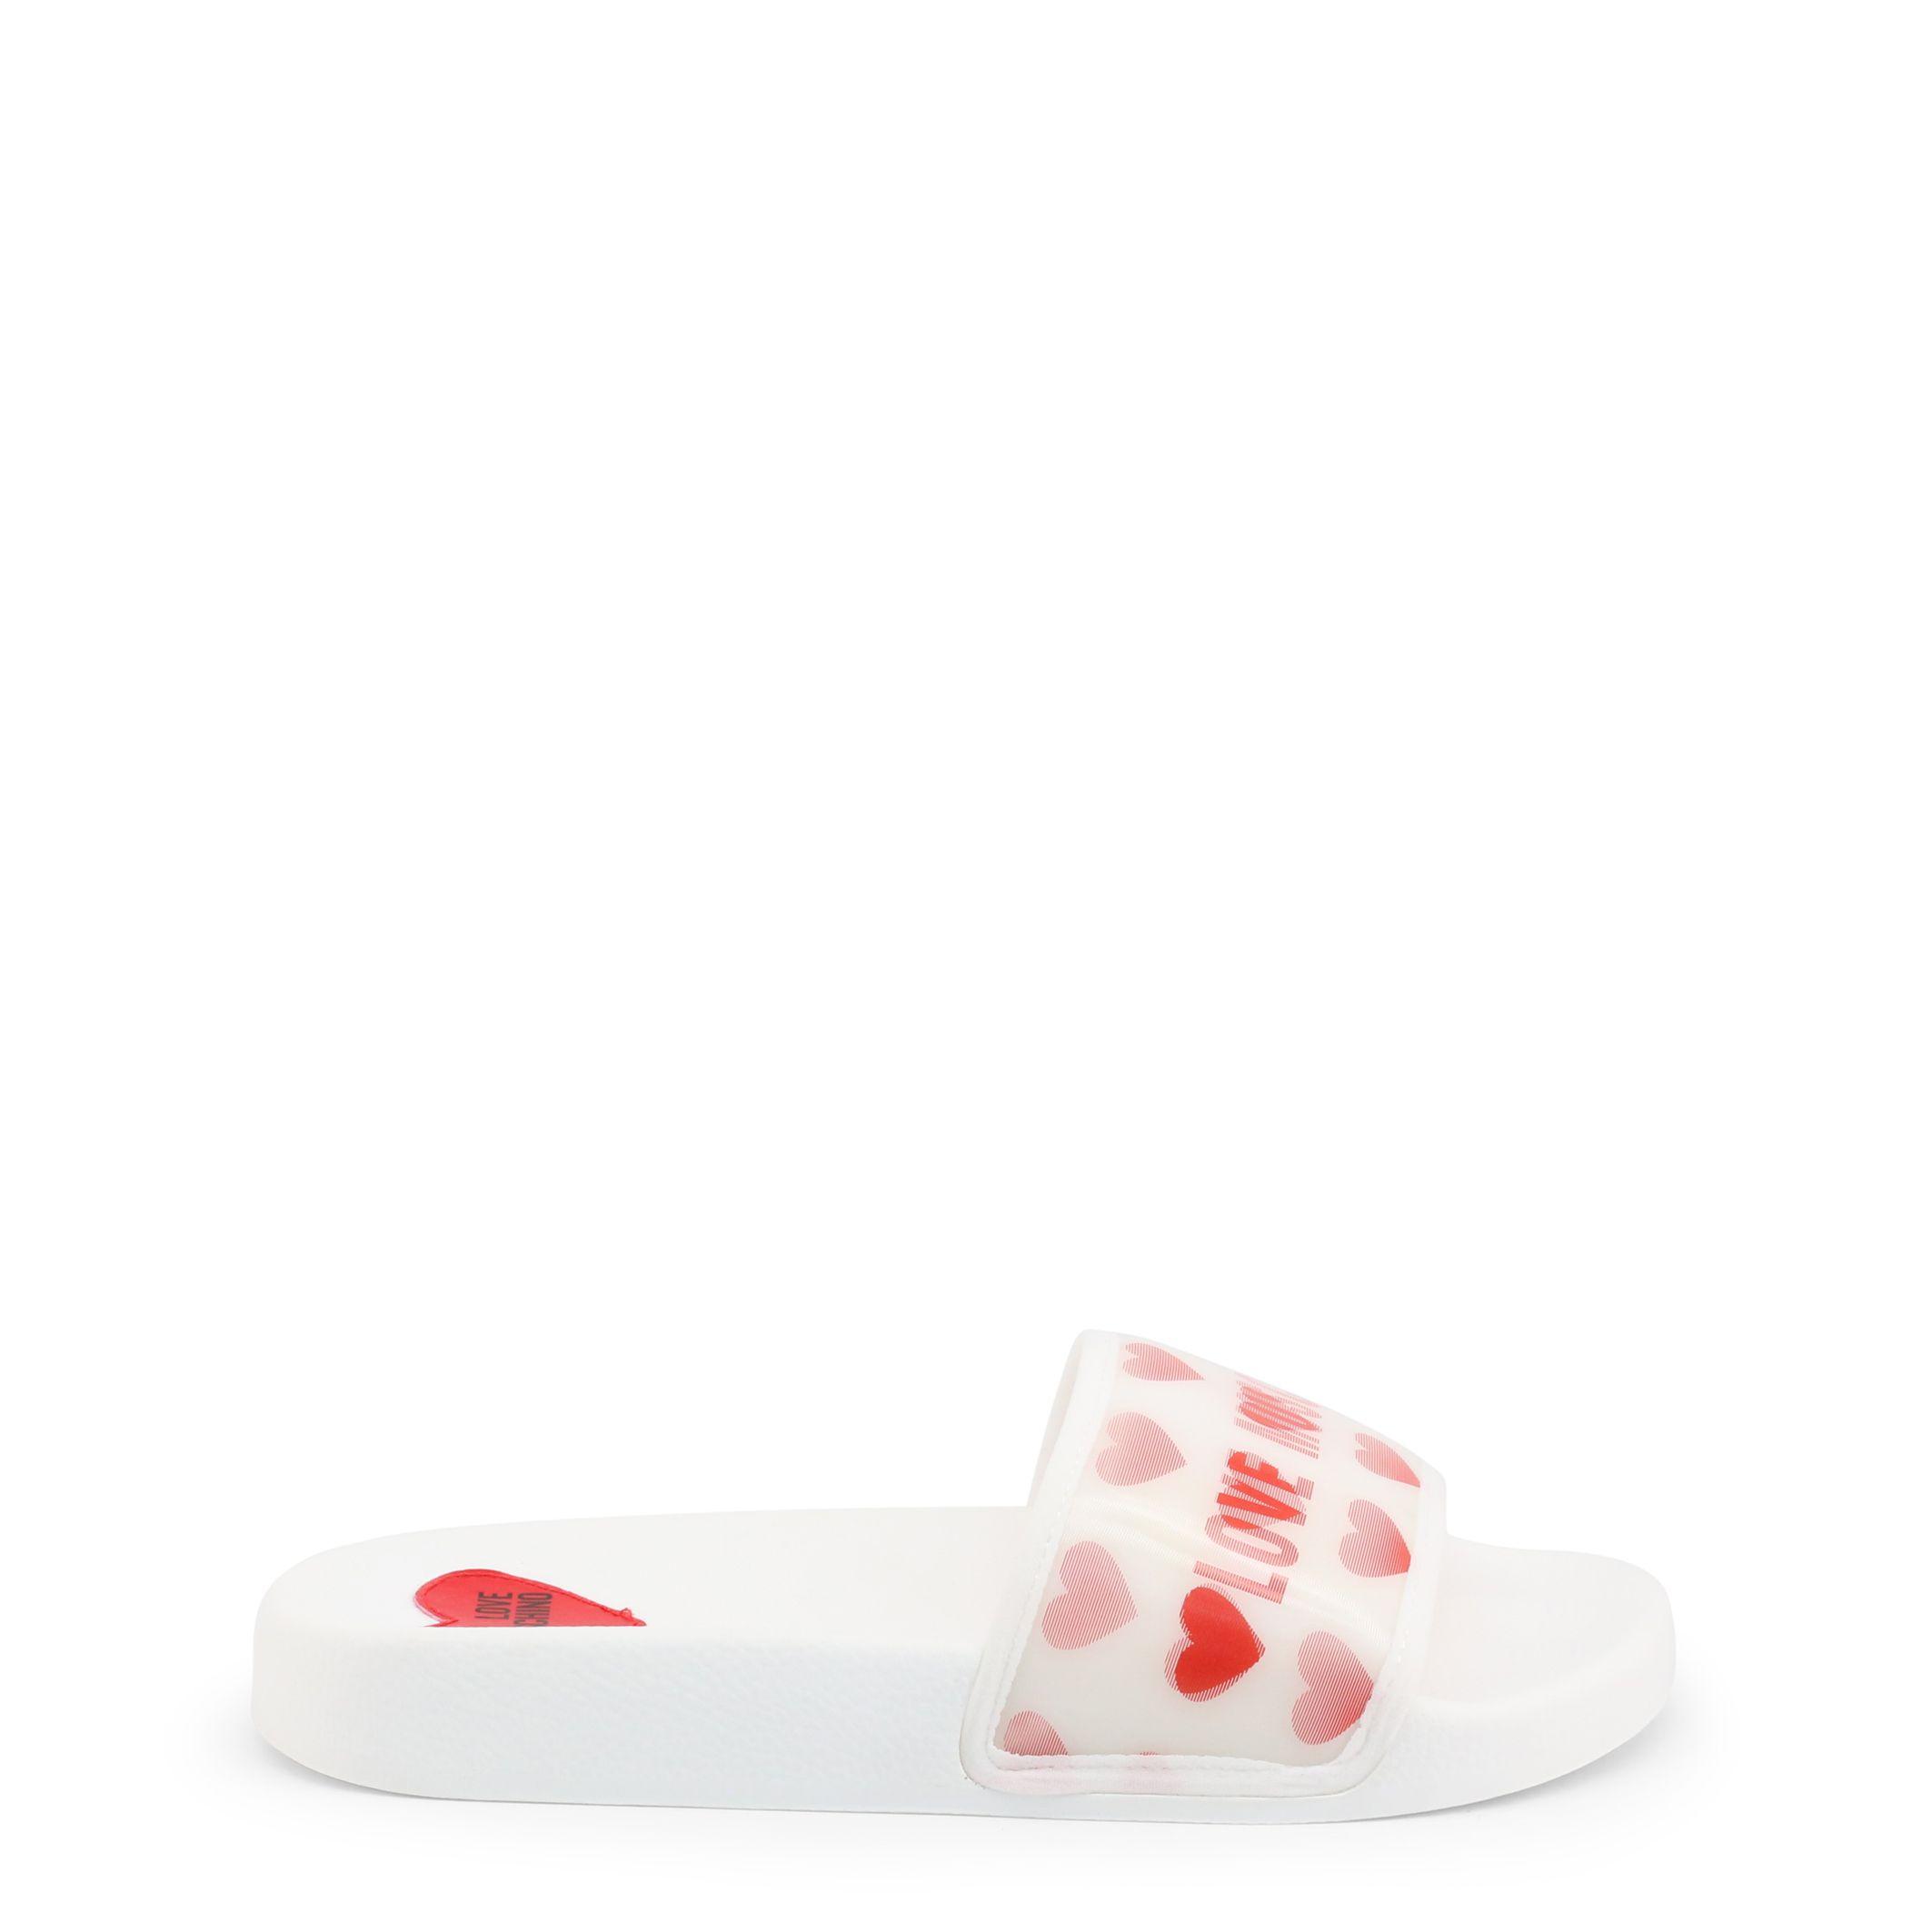 Dámské pantofle Love Moschino